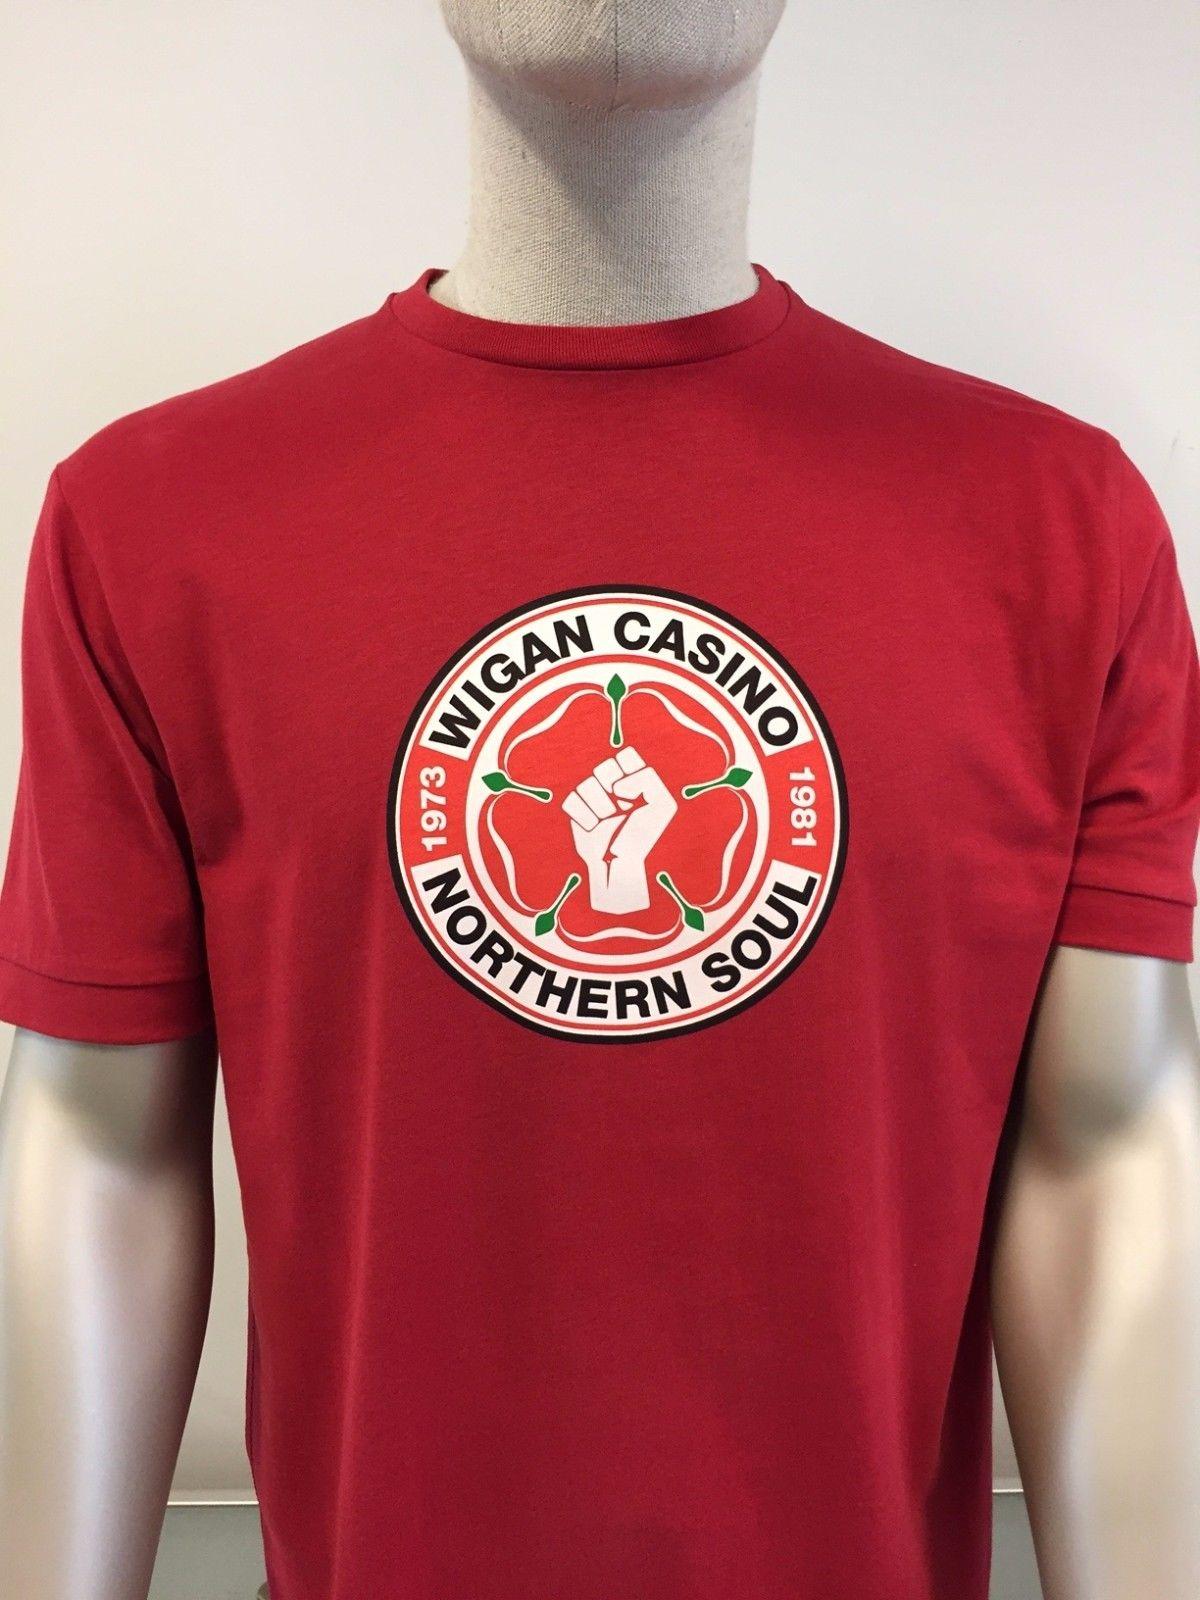 Wigan Casino 2089 old gold logo short-sleeved T-shirt size medium-3XL